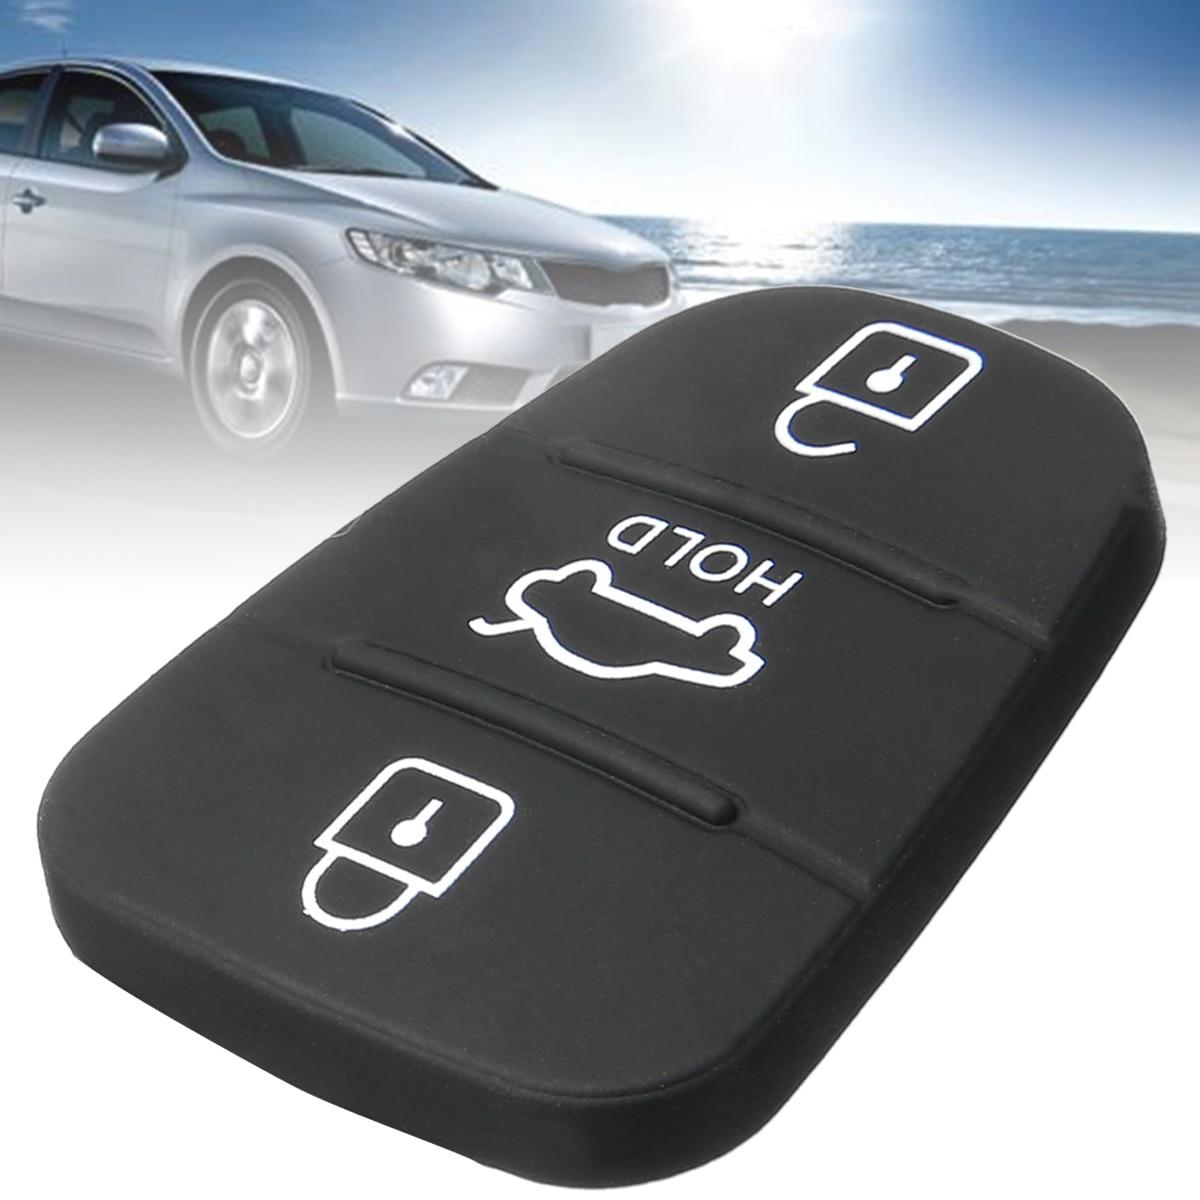 1pcs 3 Buttons Car Key Pad Flip Key For Hyundai i20 i30 Kia Solaris Rio Sorento Sportage Ceed in Key Case for Car from Automobiles Motorcycles